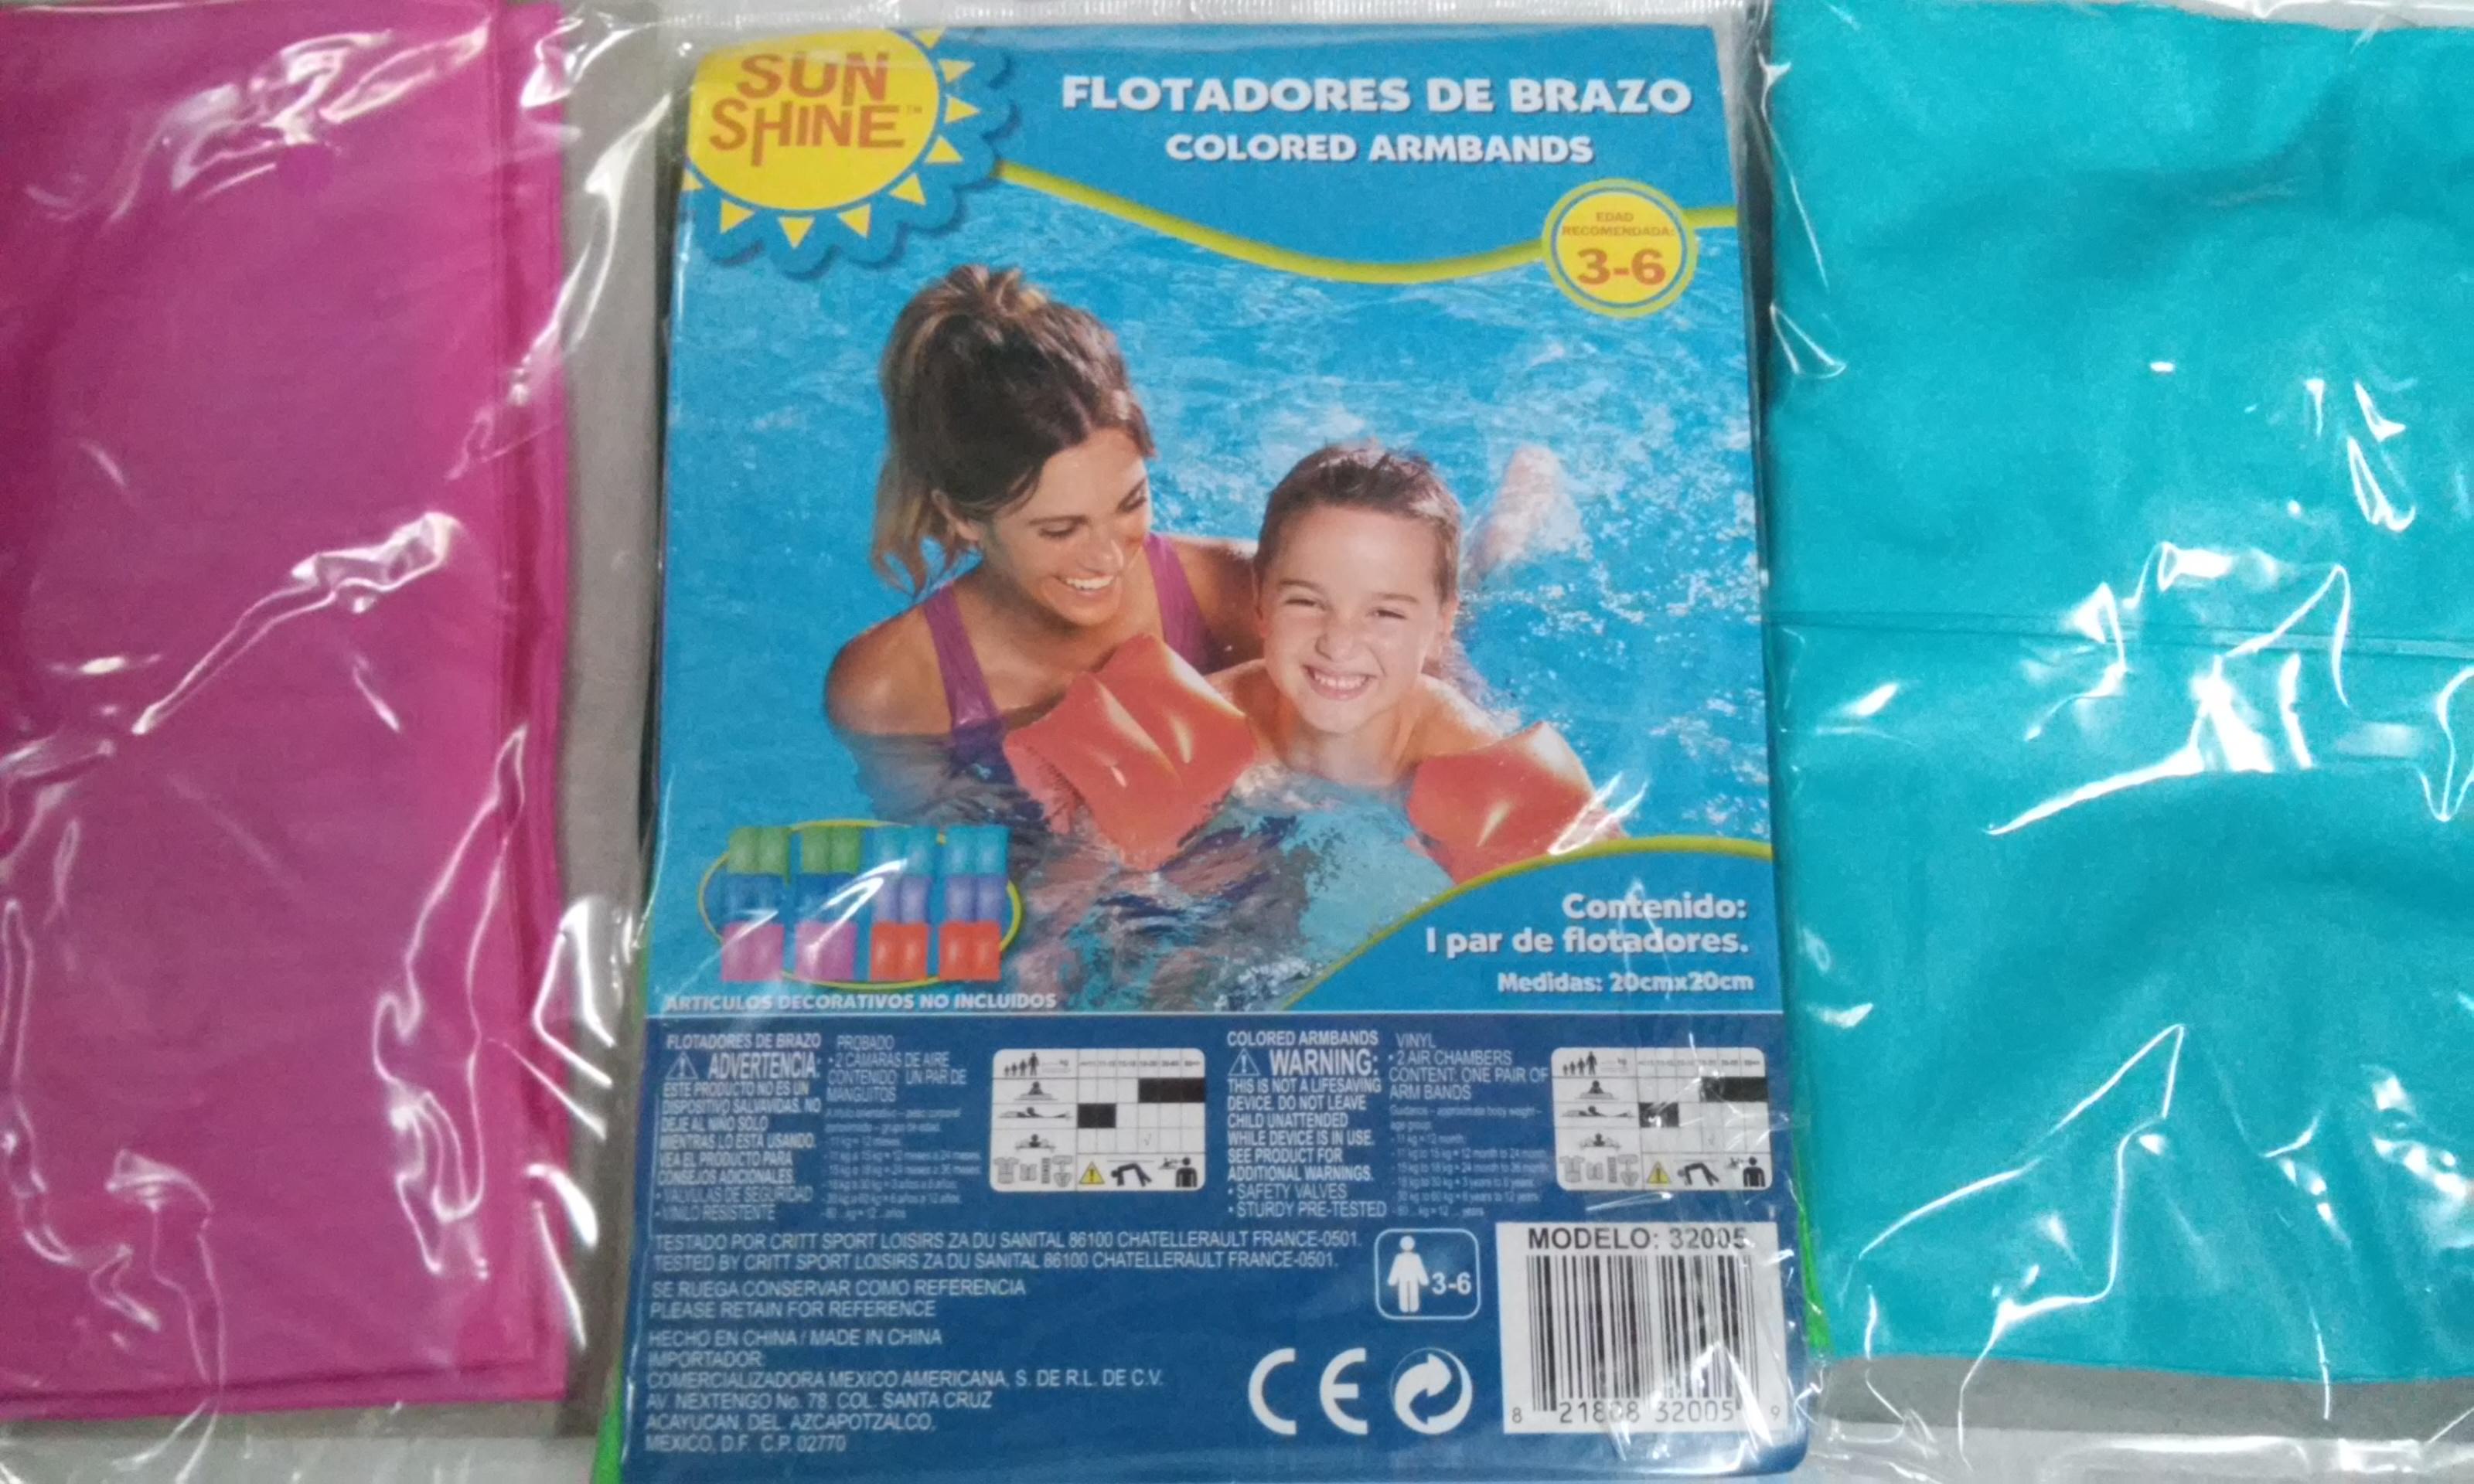 Walmart Cuitláhuac: Flotis para niños a $5.03 SunShine